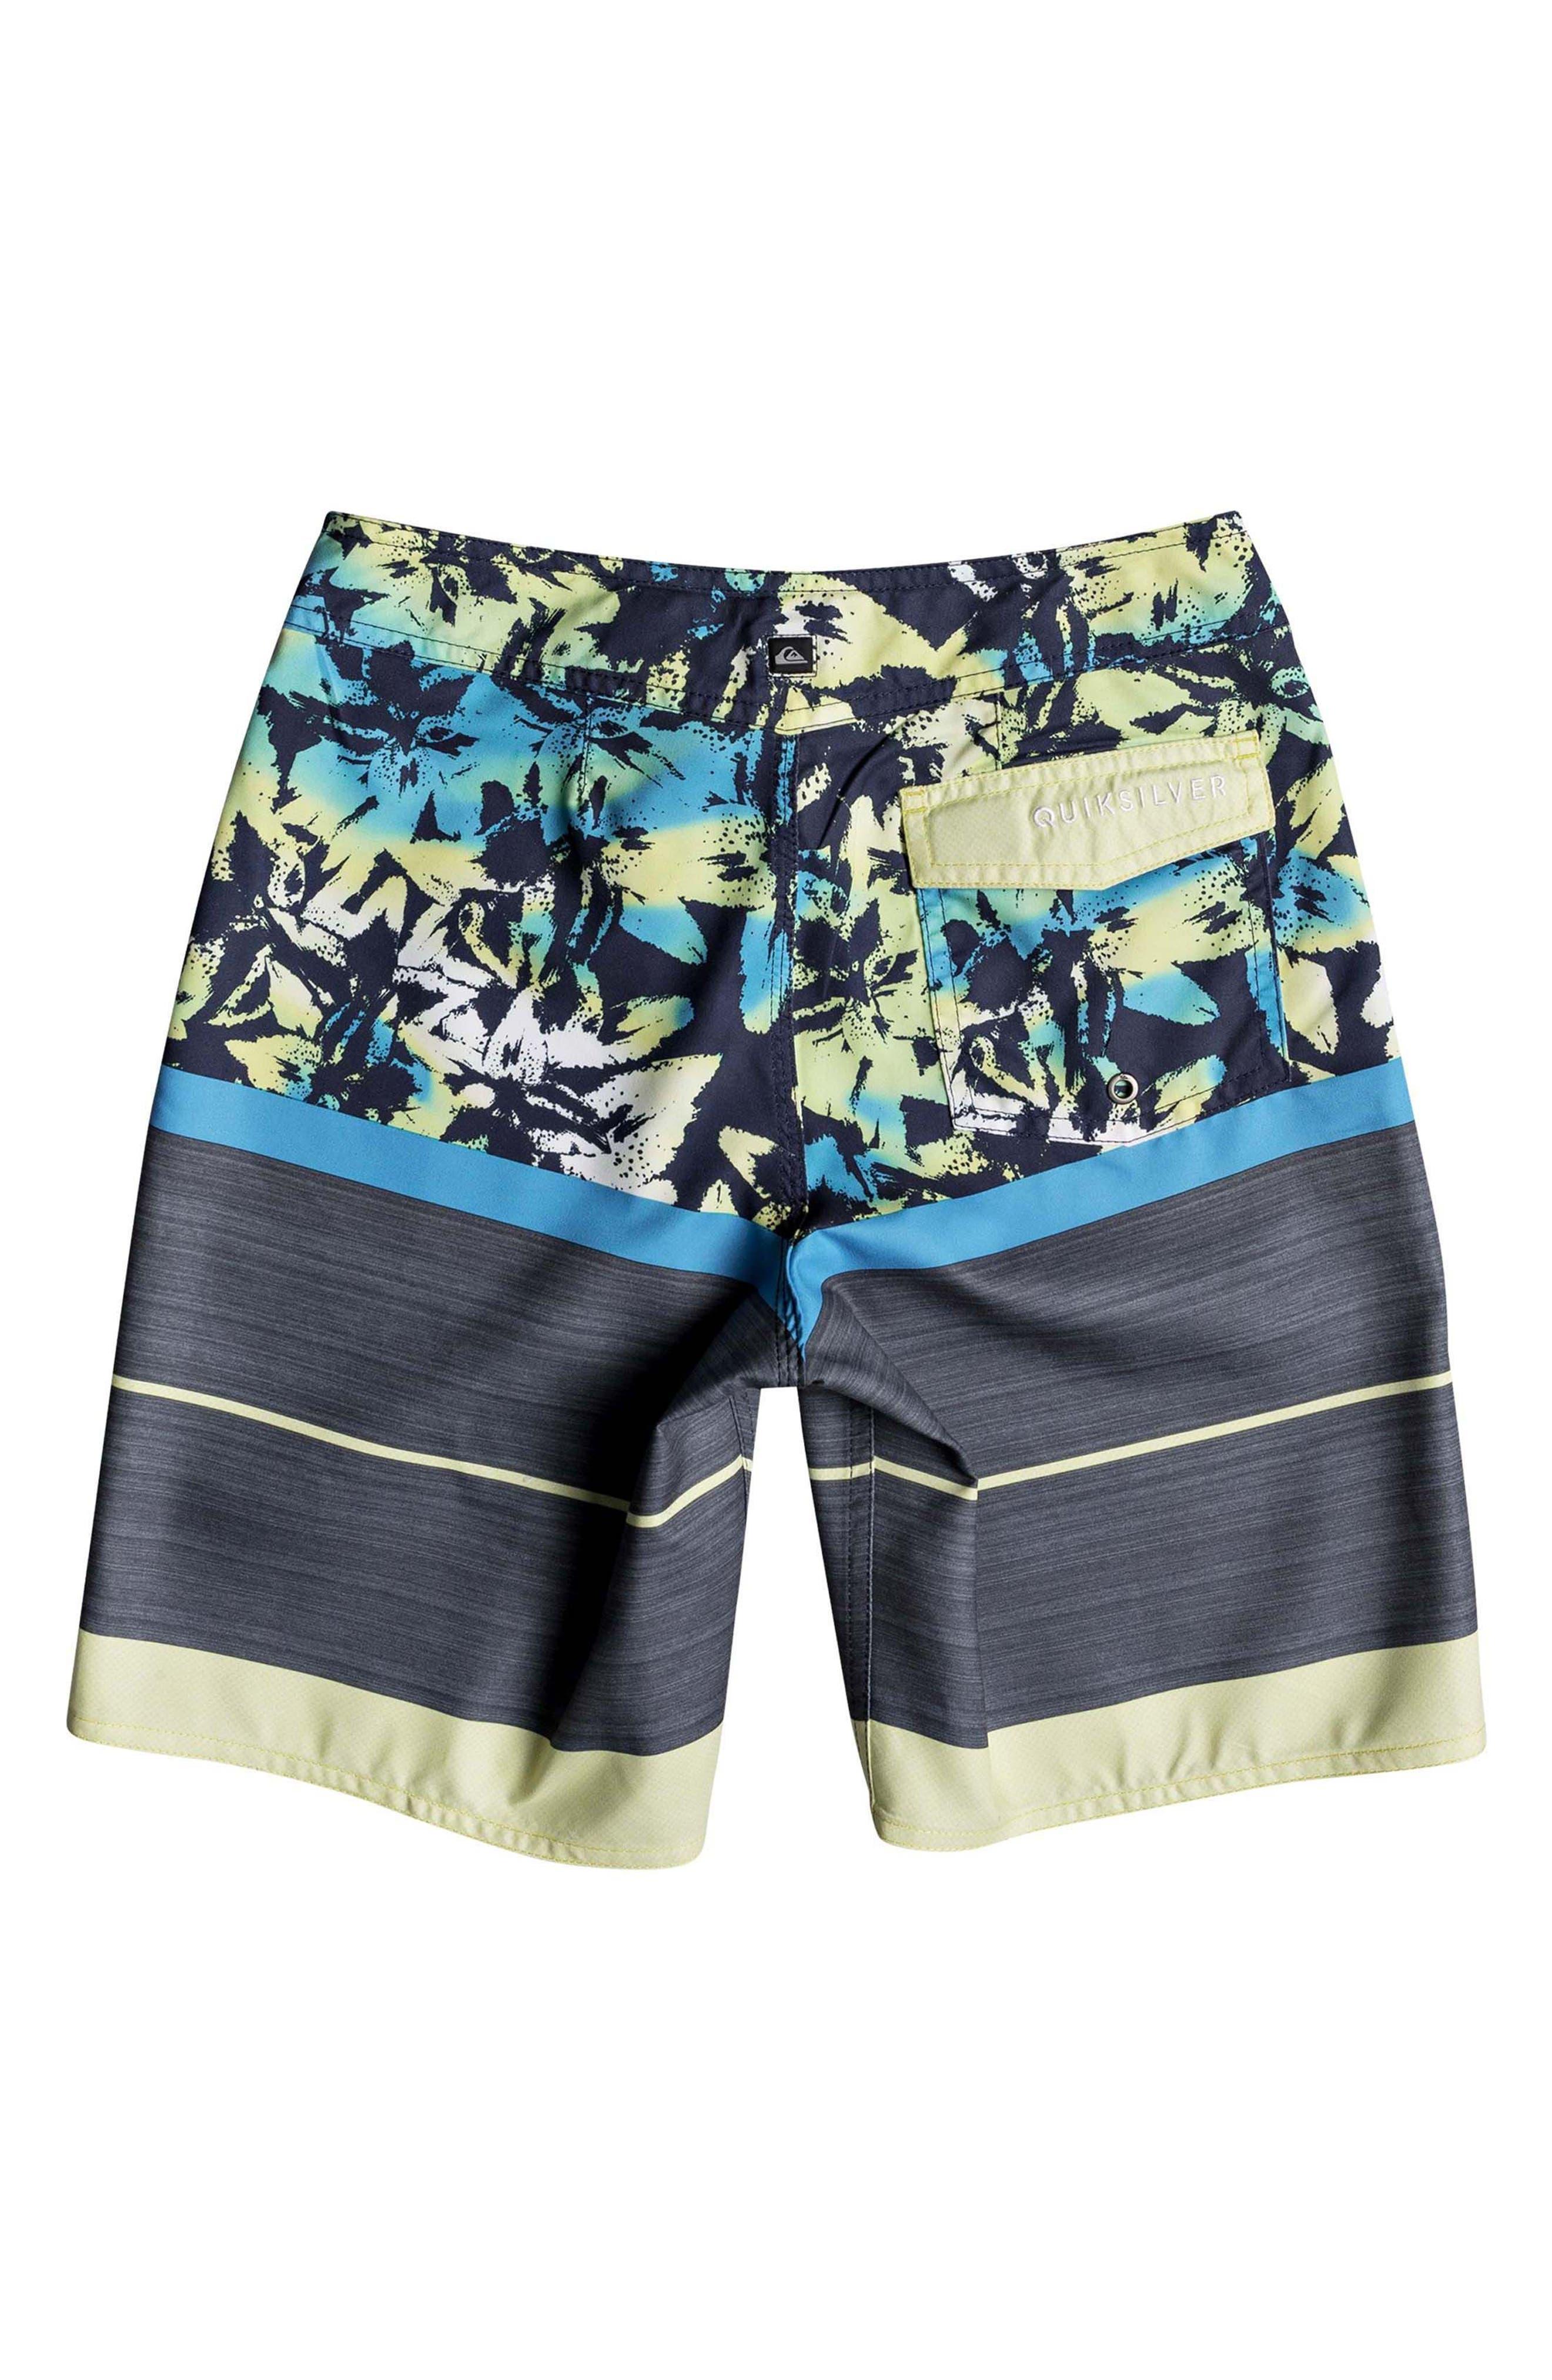 Slab Island Board Shorts,                             Alternate thumbnail 2, color,                             Cyan Blue